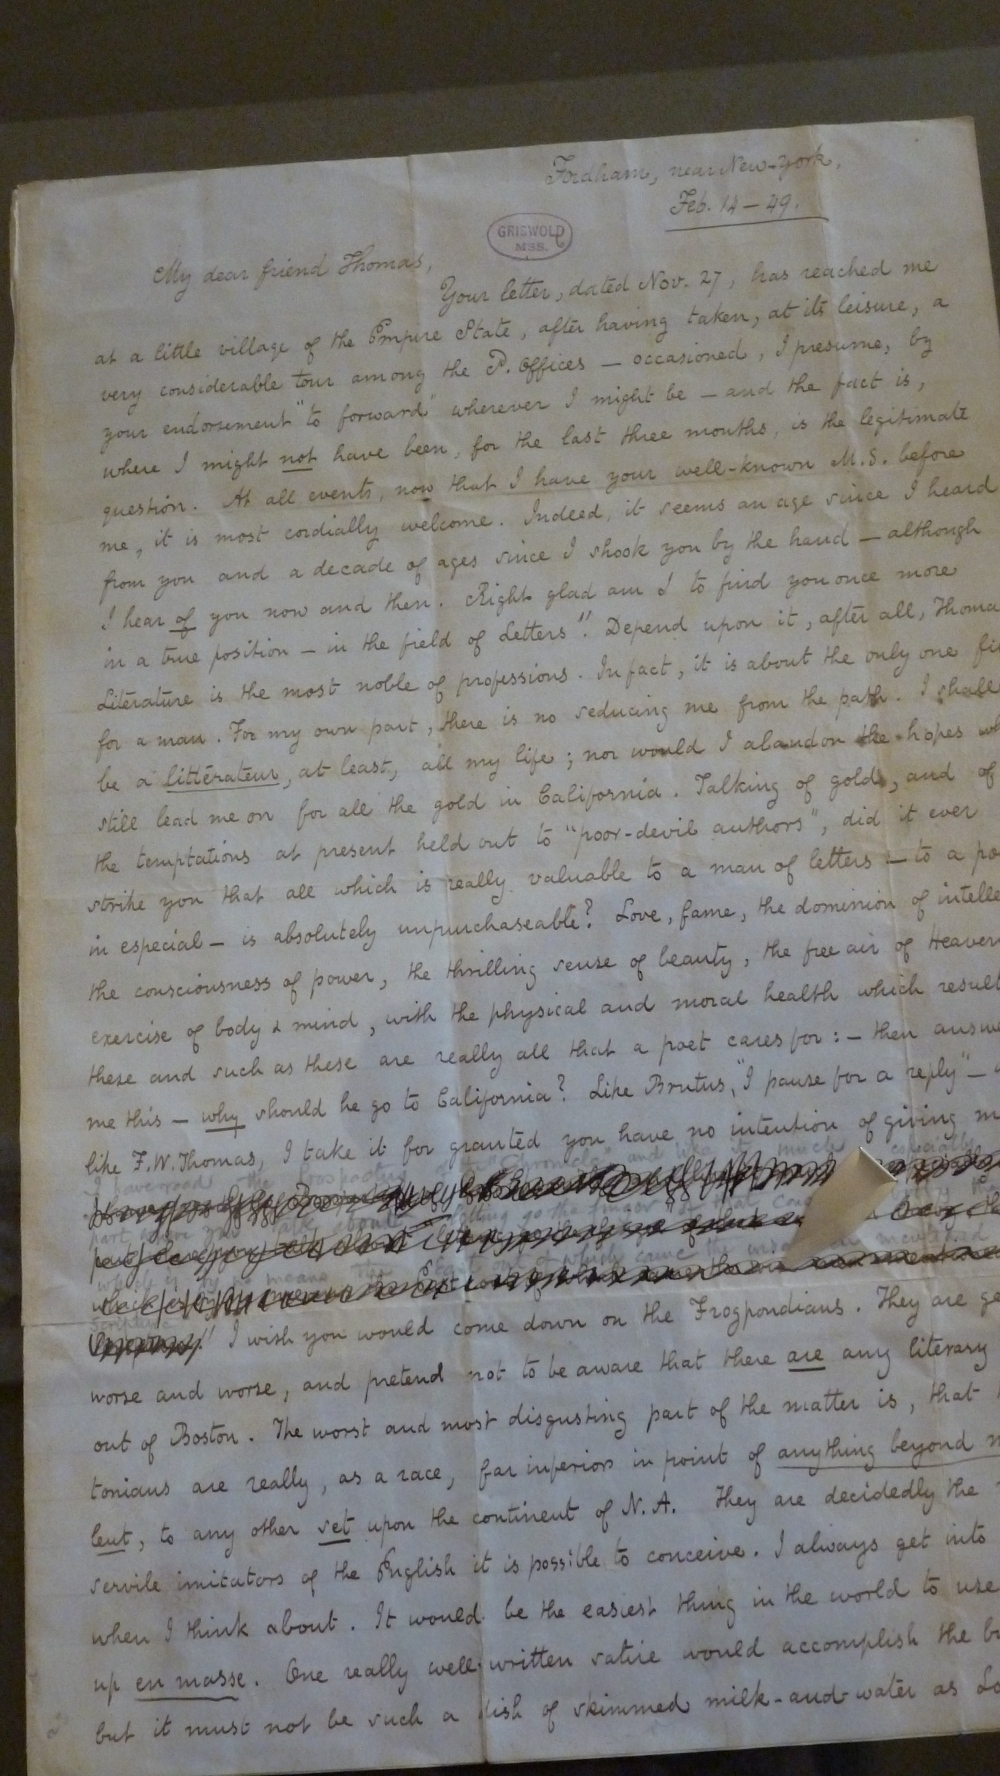 Poe letter